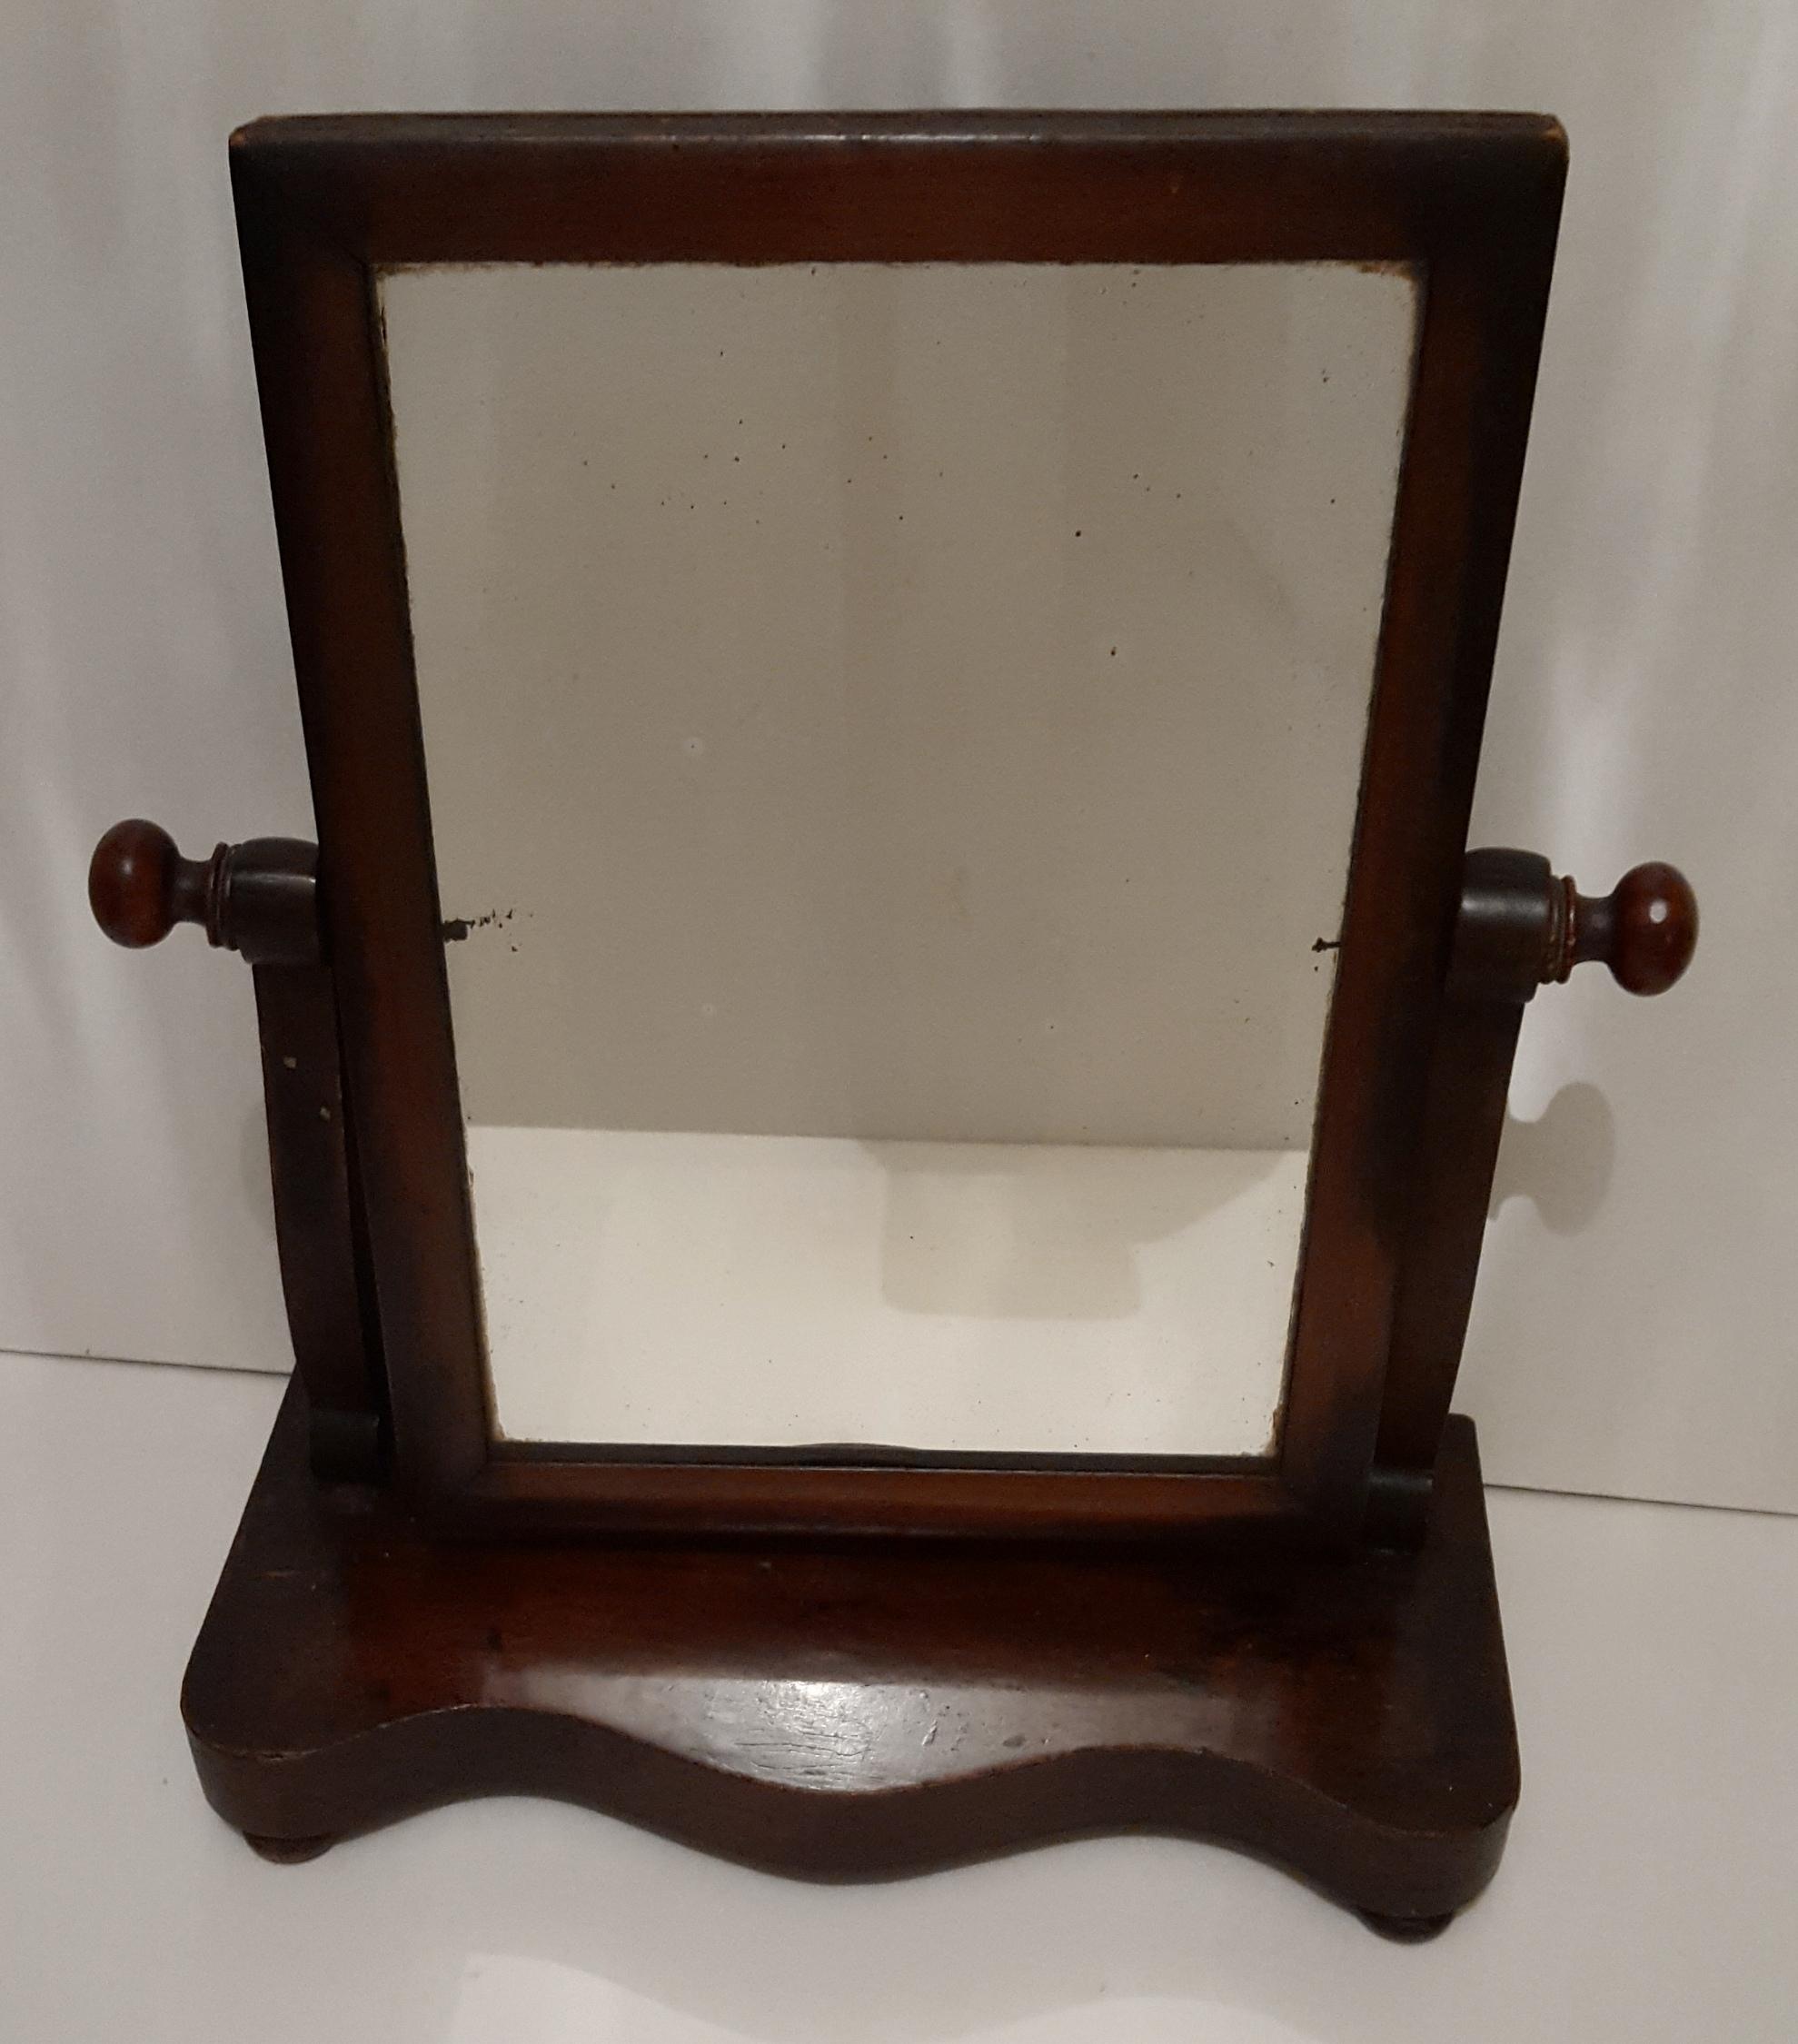 Lot 63 - Antique Victorian Wash Stand Swivel Mirror Mahogany. NO RESERVE